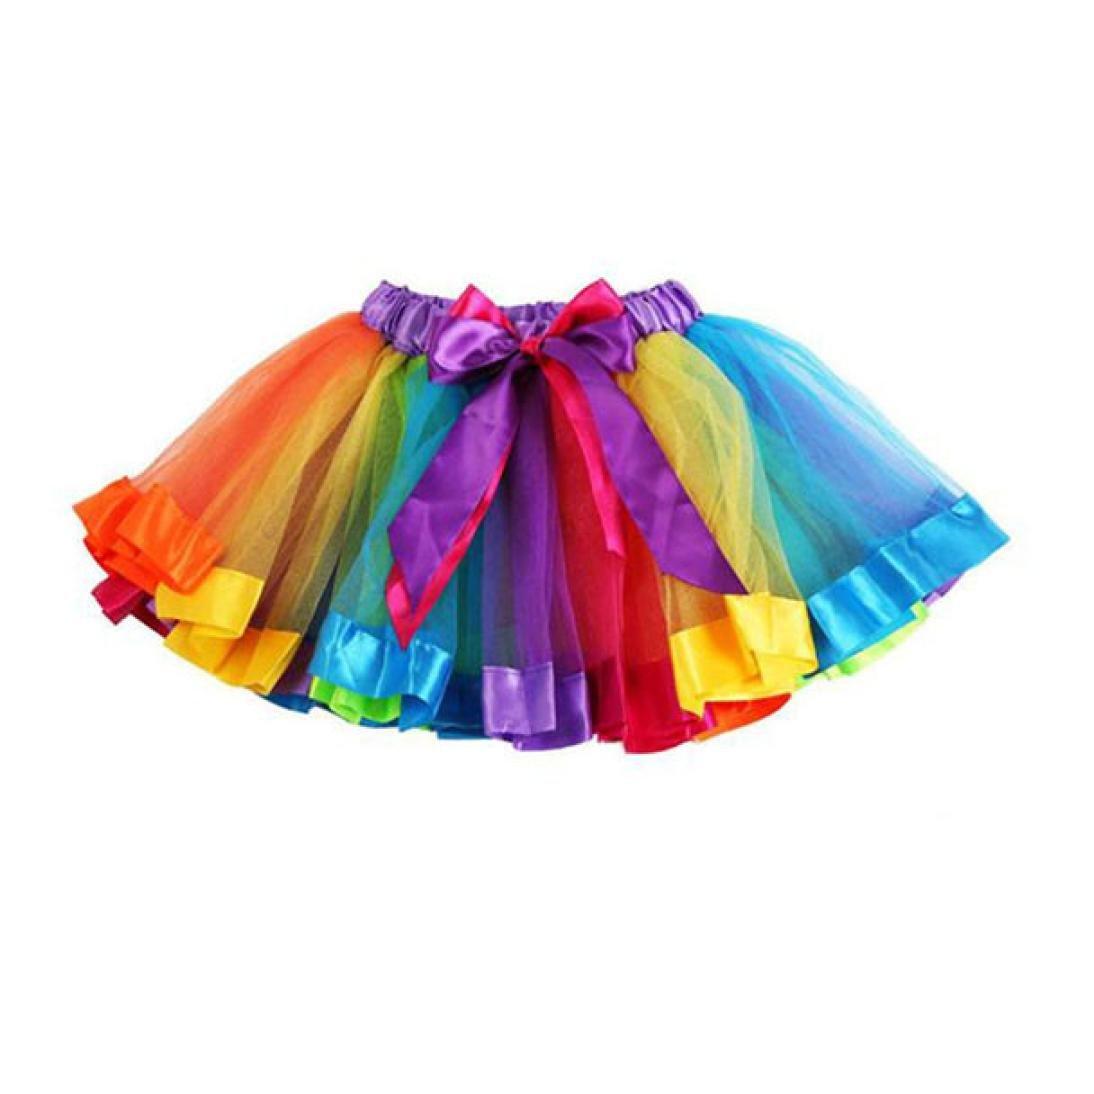 Amlaiworld Girls Kids Petticoat Rainbow Pettiskirt Bowknot Skirt Tutu Dress Dancewear